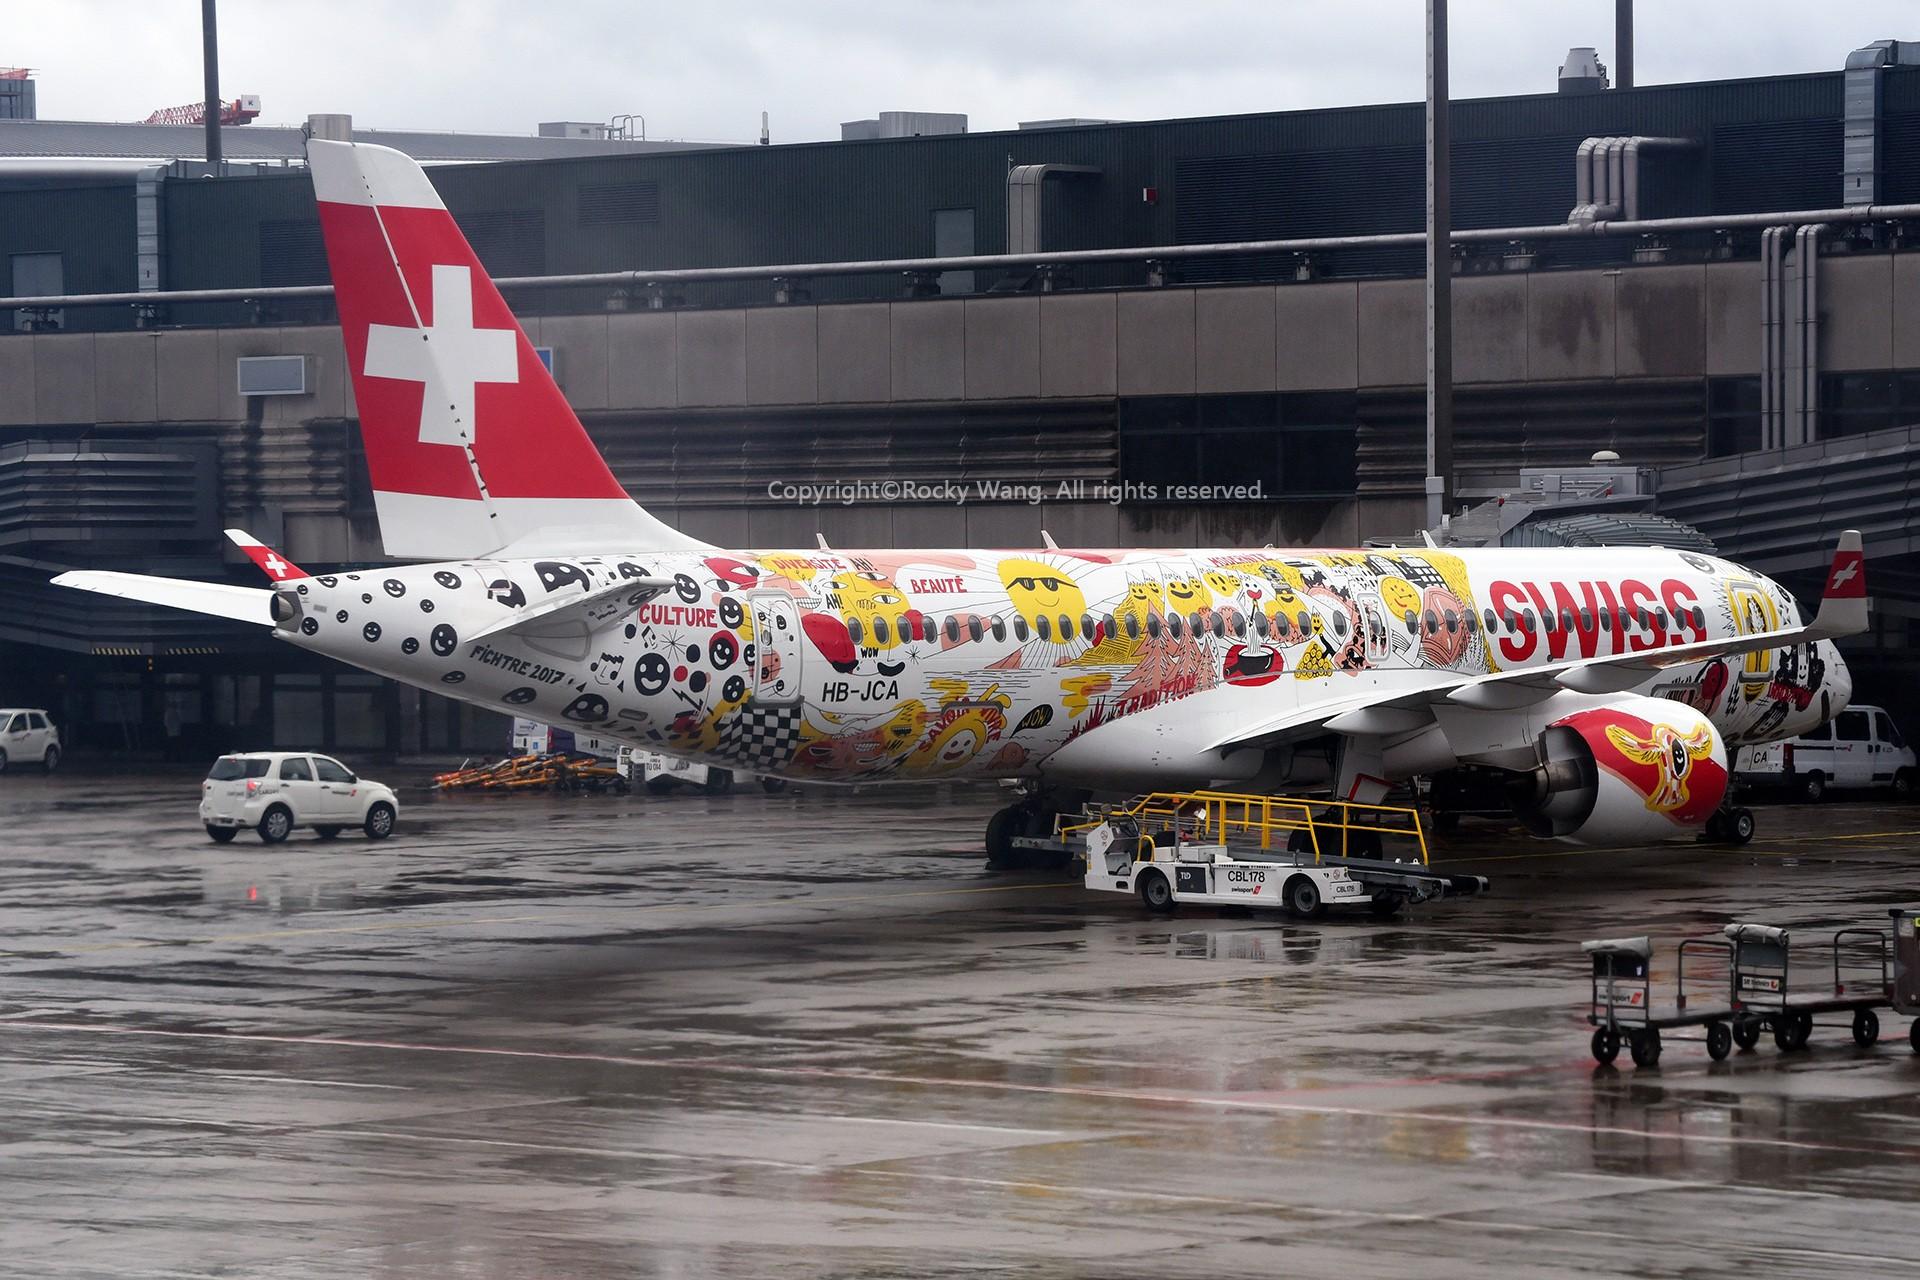 Re:[原创]简易版游记,纪念一次30段的环球飞行和一些碎碎念 BOMBARDIER CSERIES CS300 HB-JCA Zurich-Kloten Airport